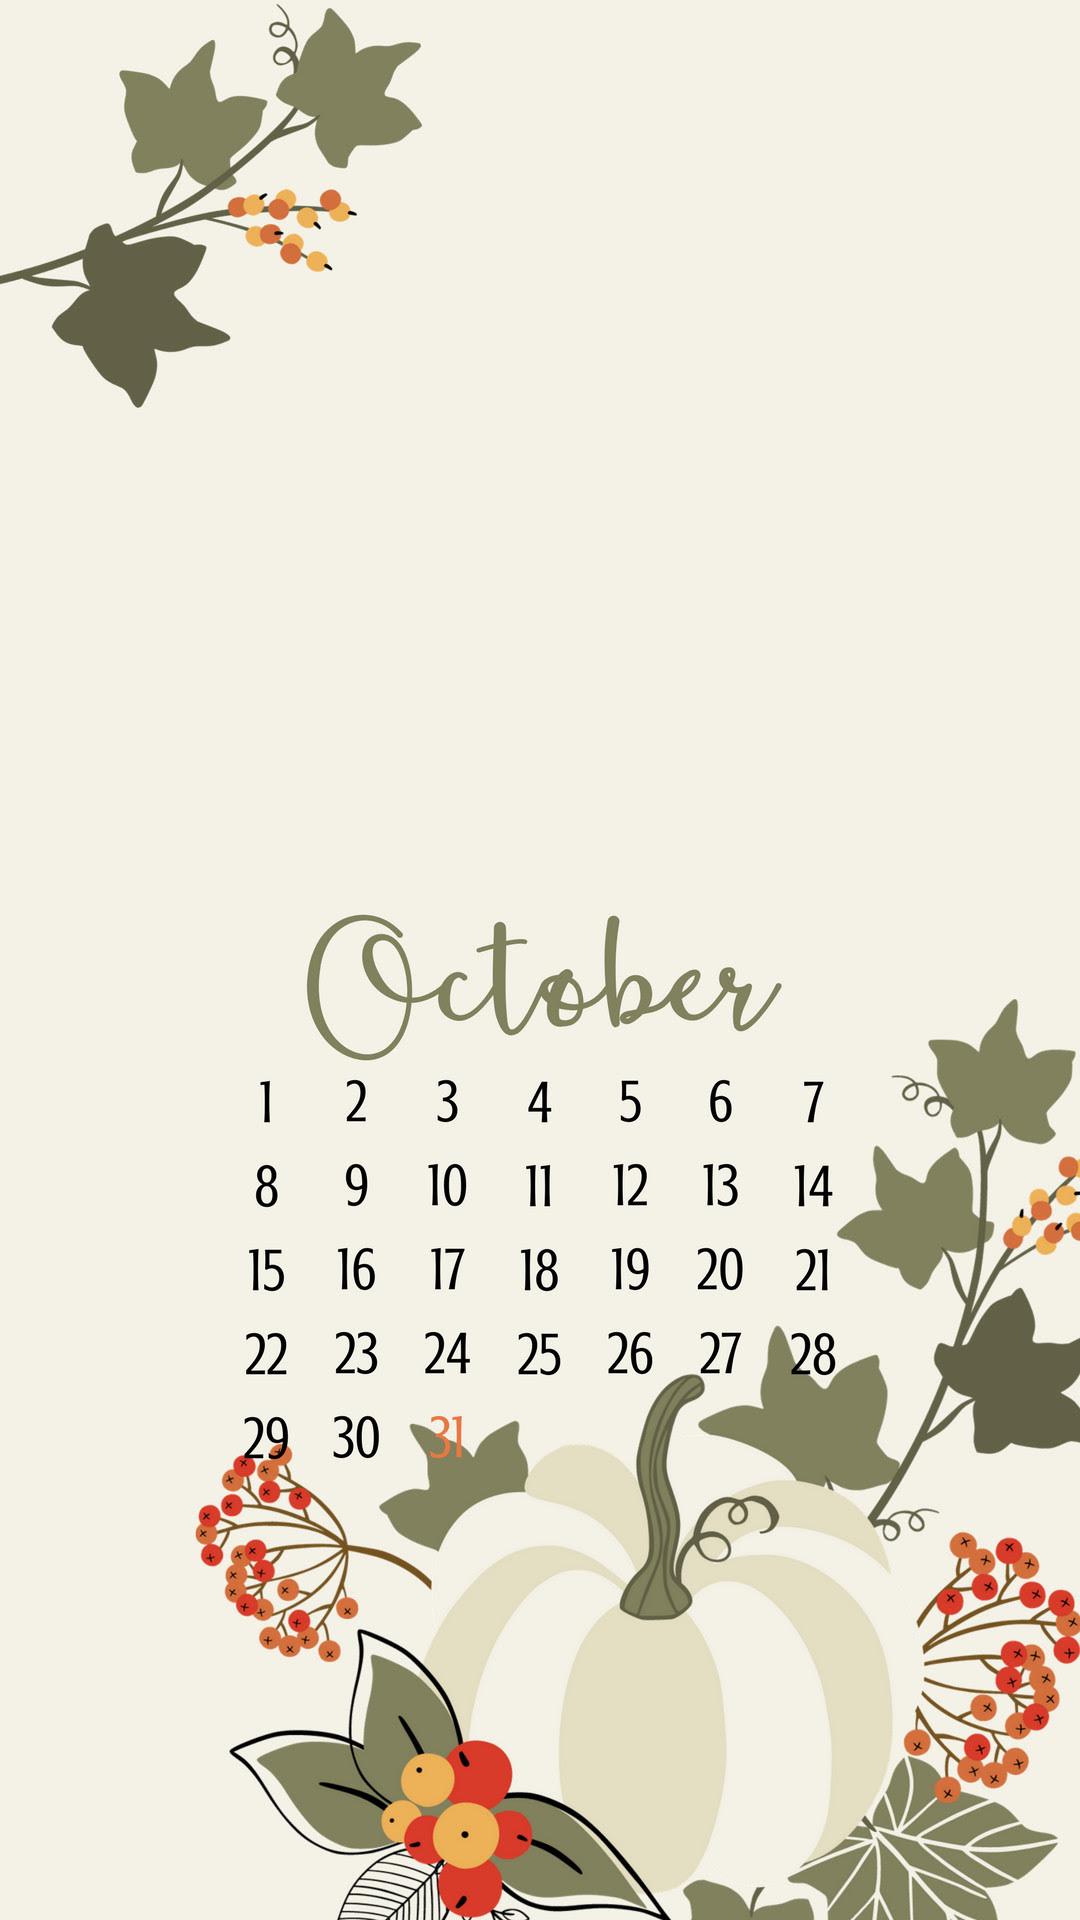 October Wallpaper Backgrounds (63+ images)